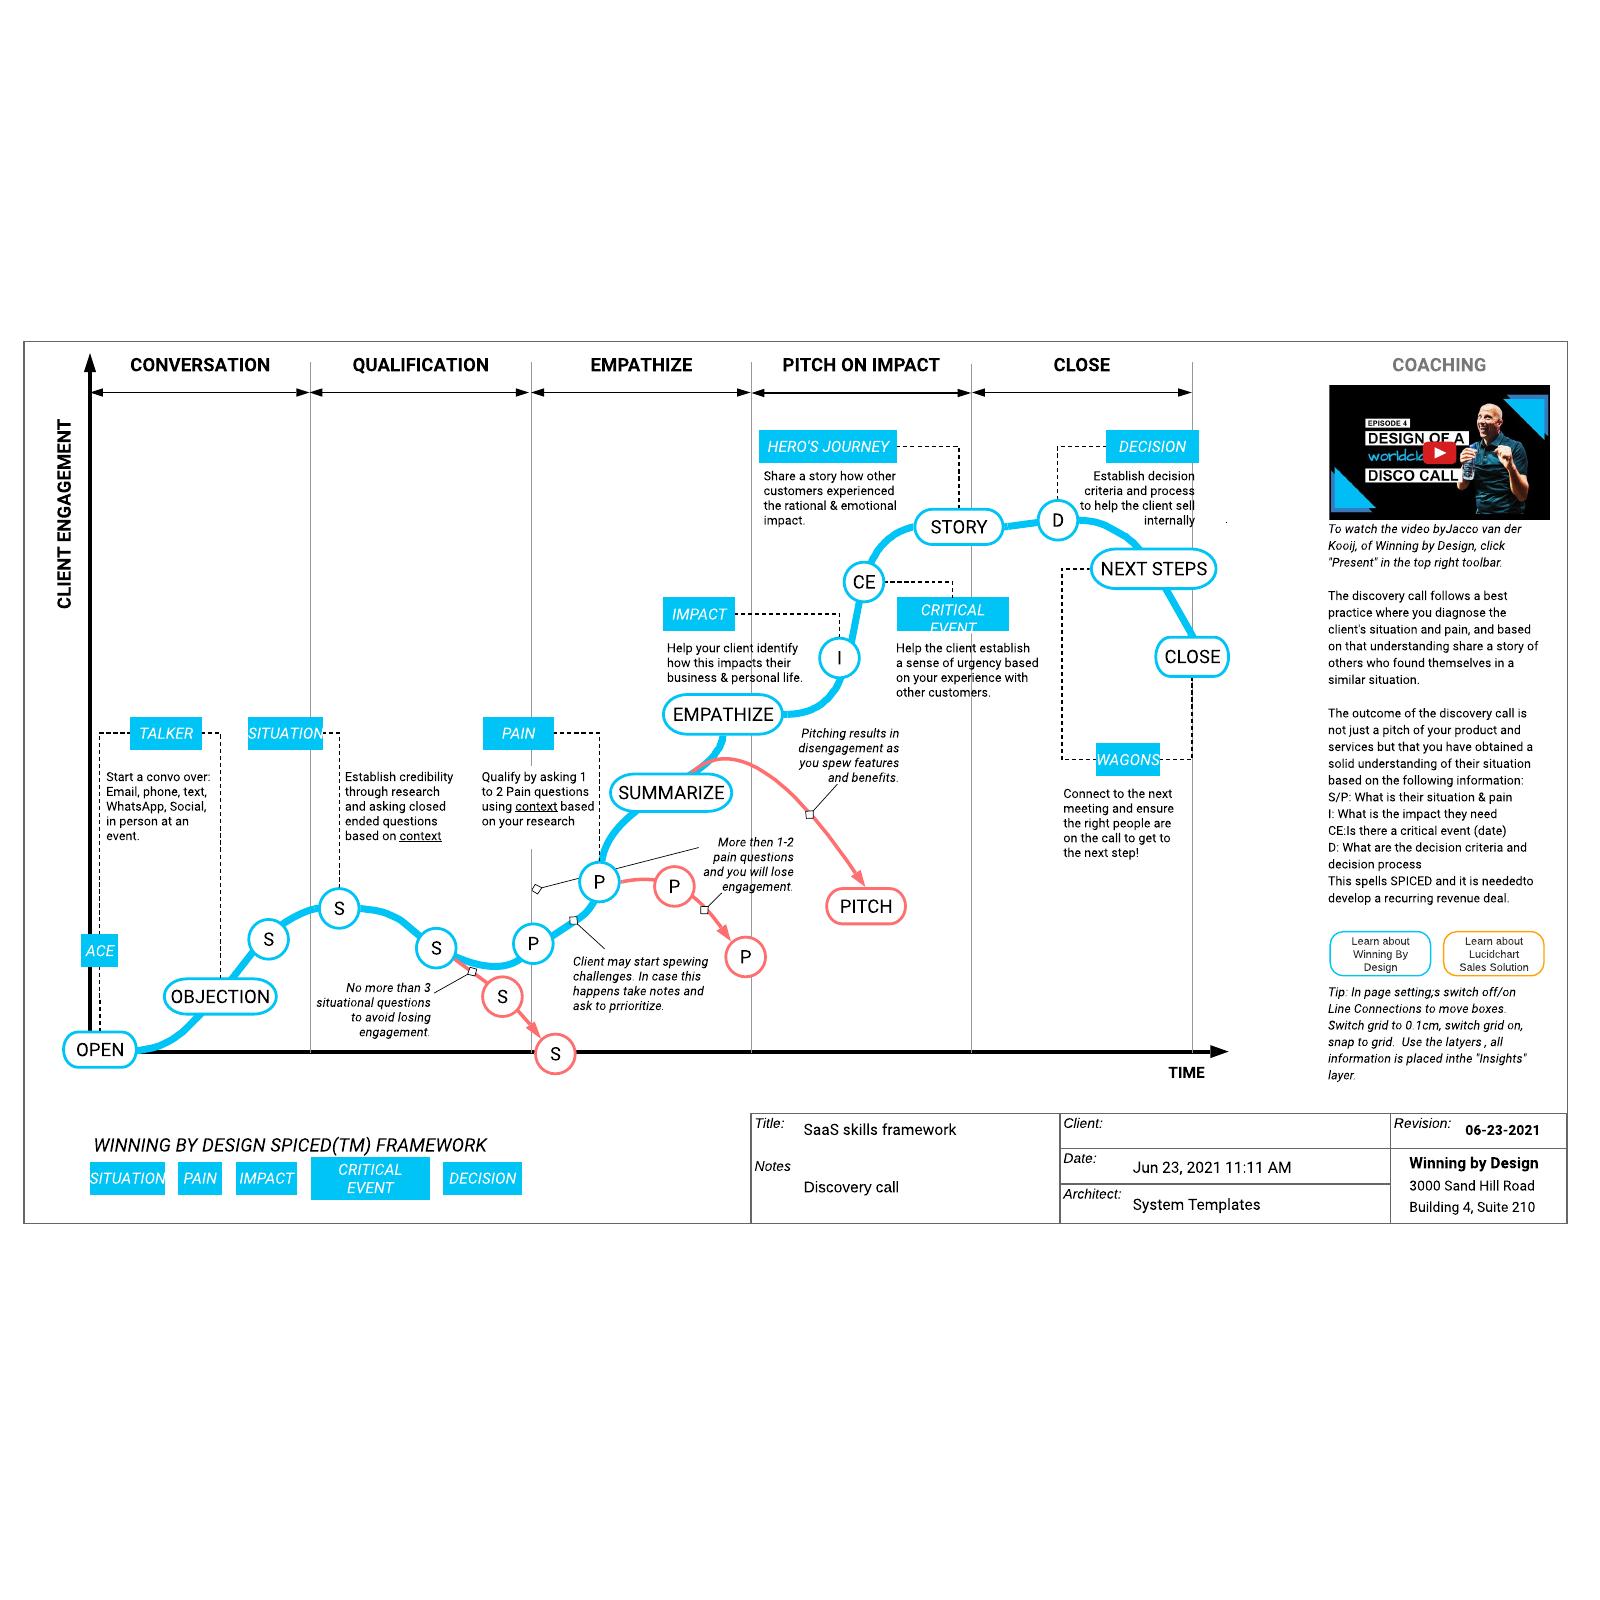 SaaS skills framework